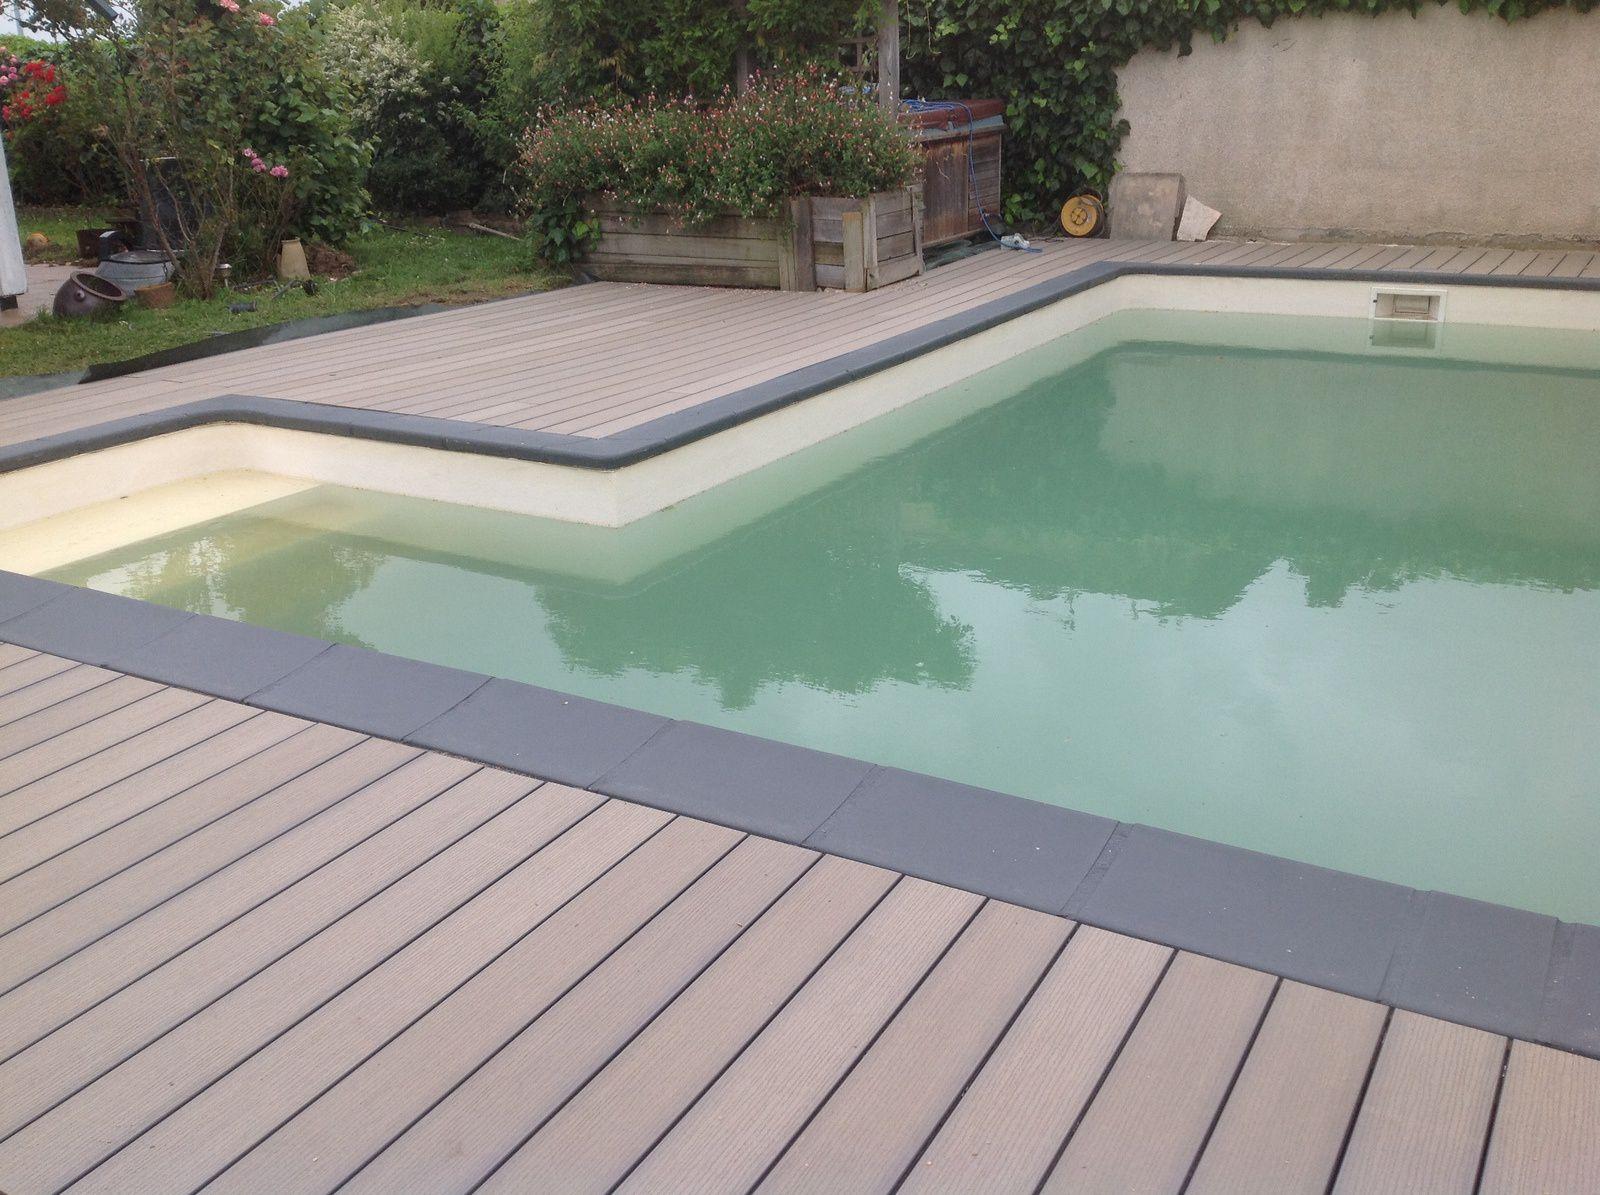 Terrasse Composite Avec Piscine intérieur Piscine Bois Composite